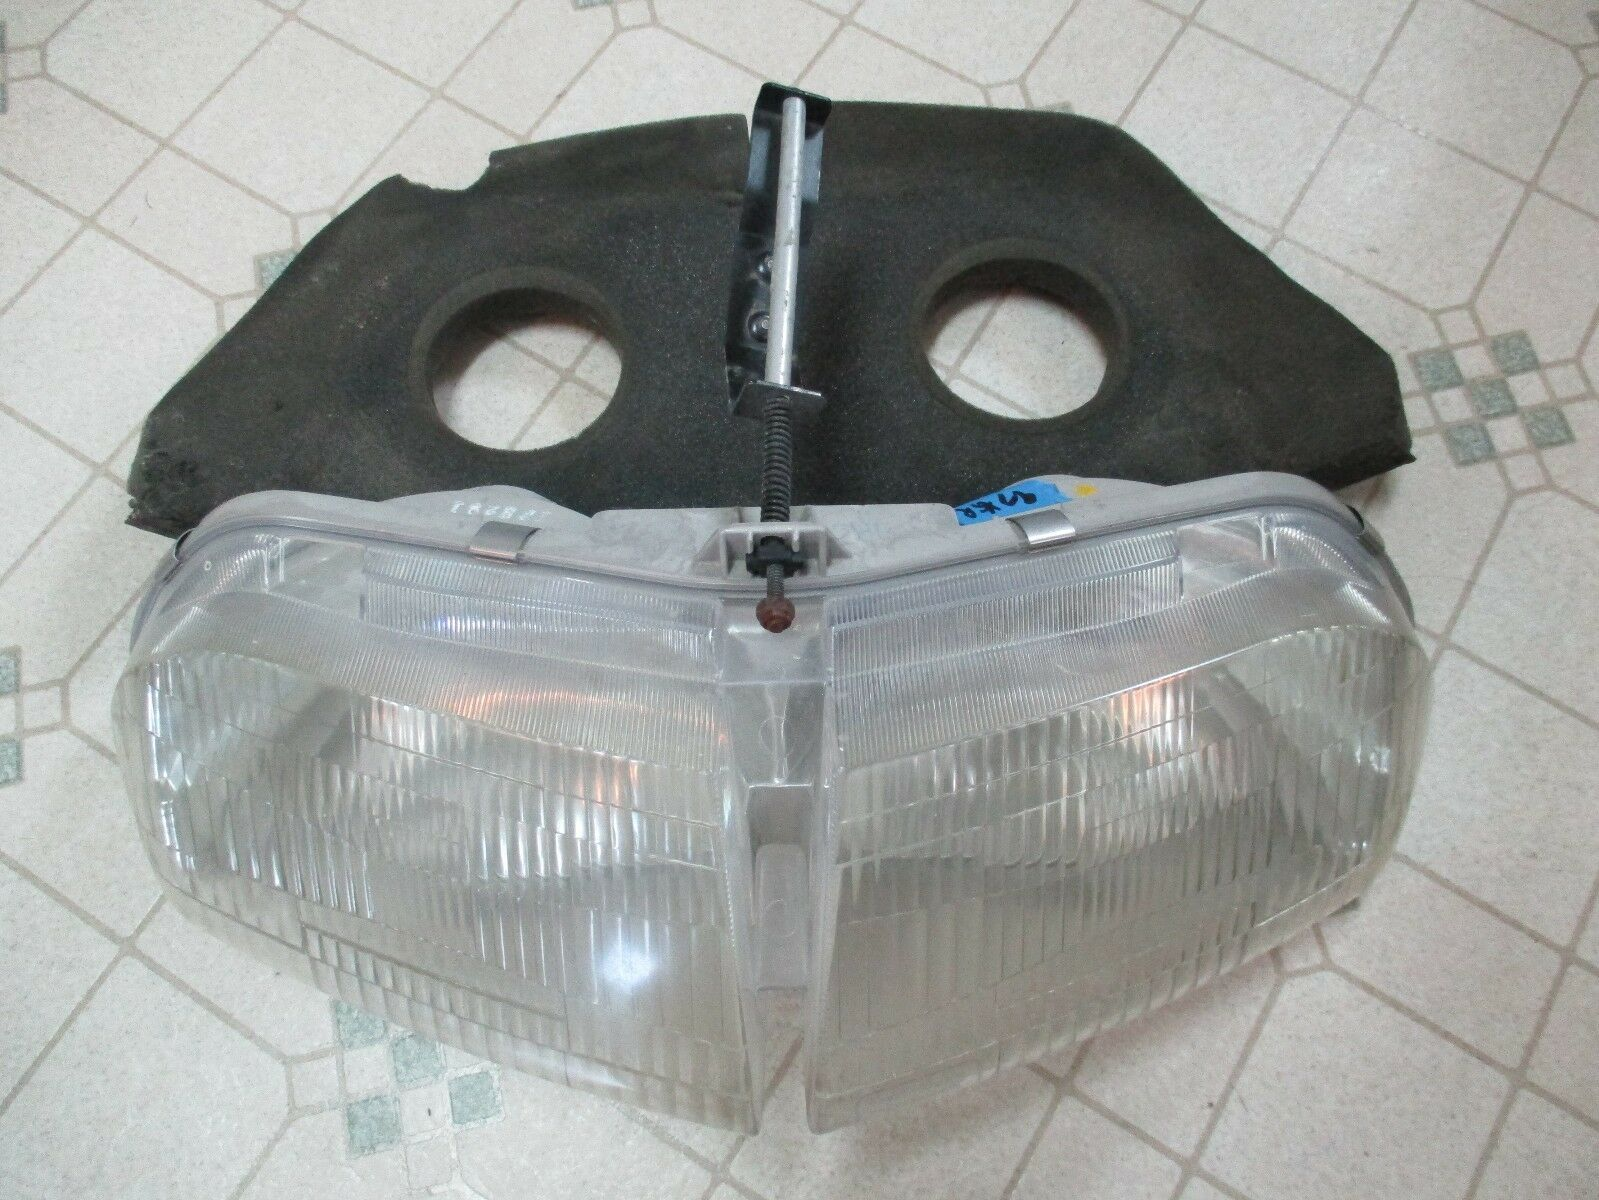 97 Polaris XCR 600 Snowmobile Headlight XLT RMK 96 98 700 ?